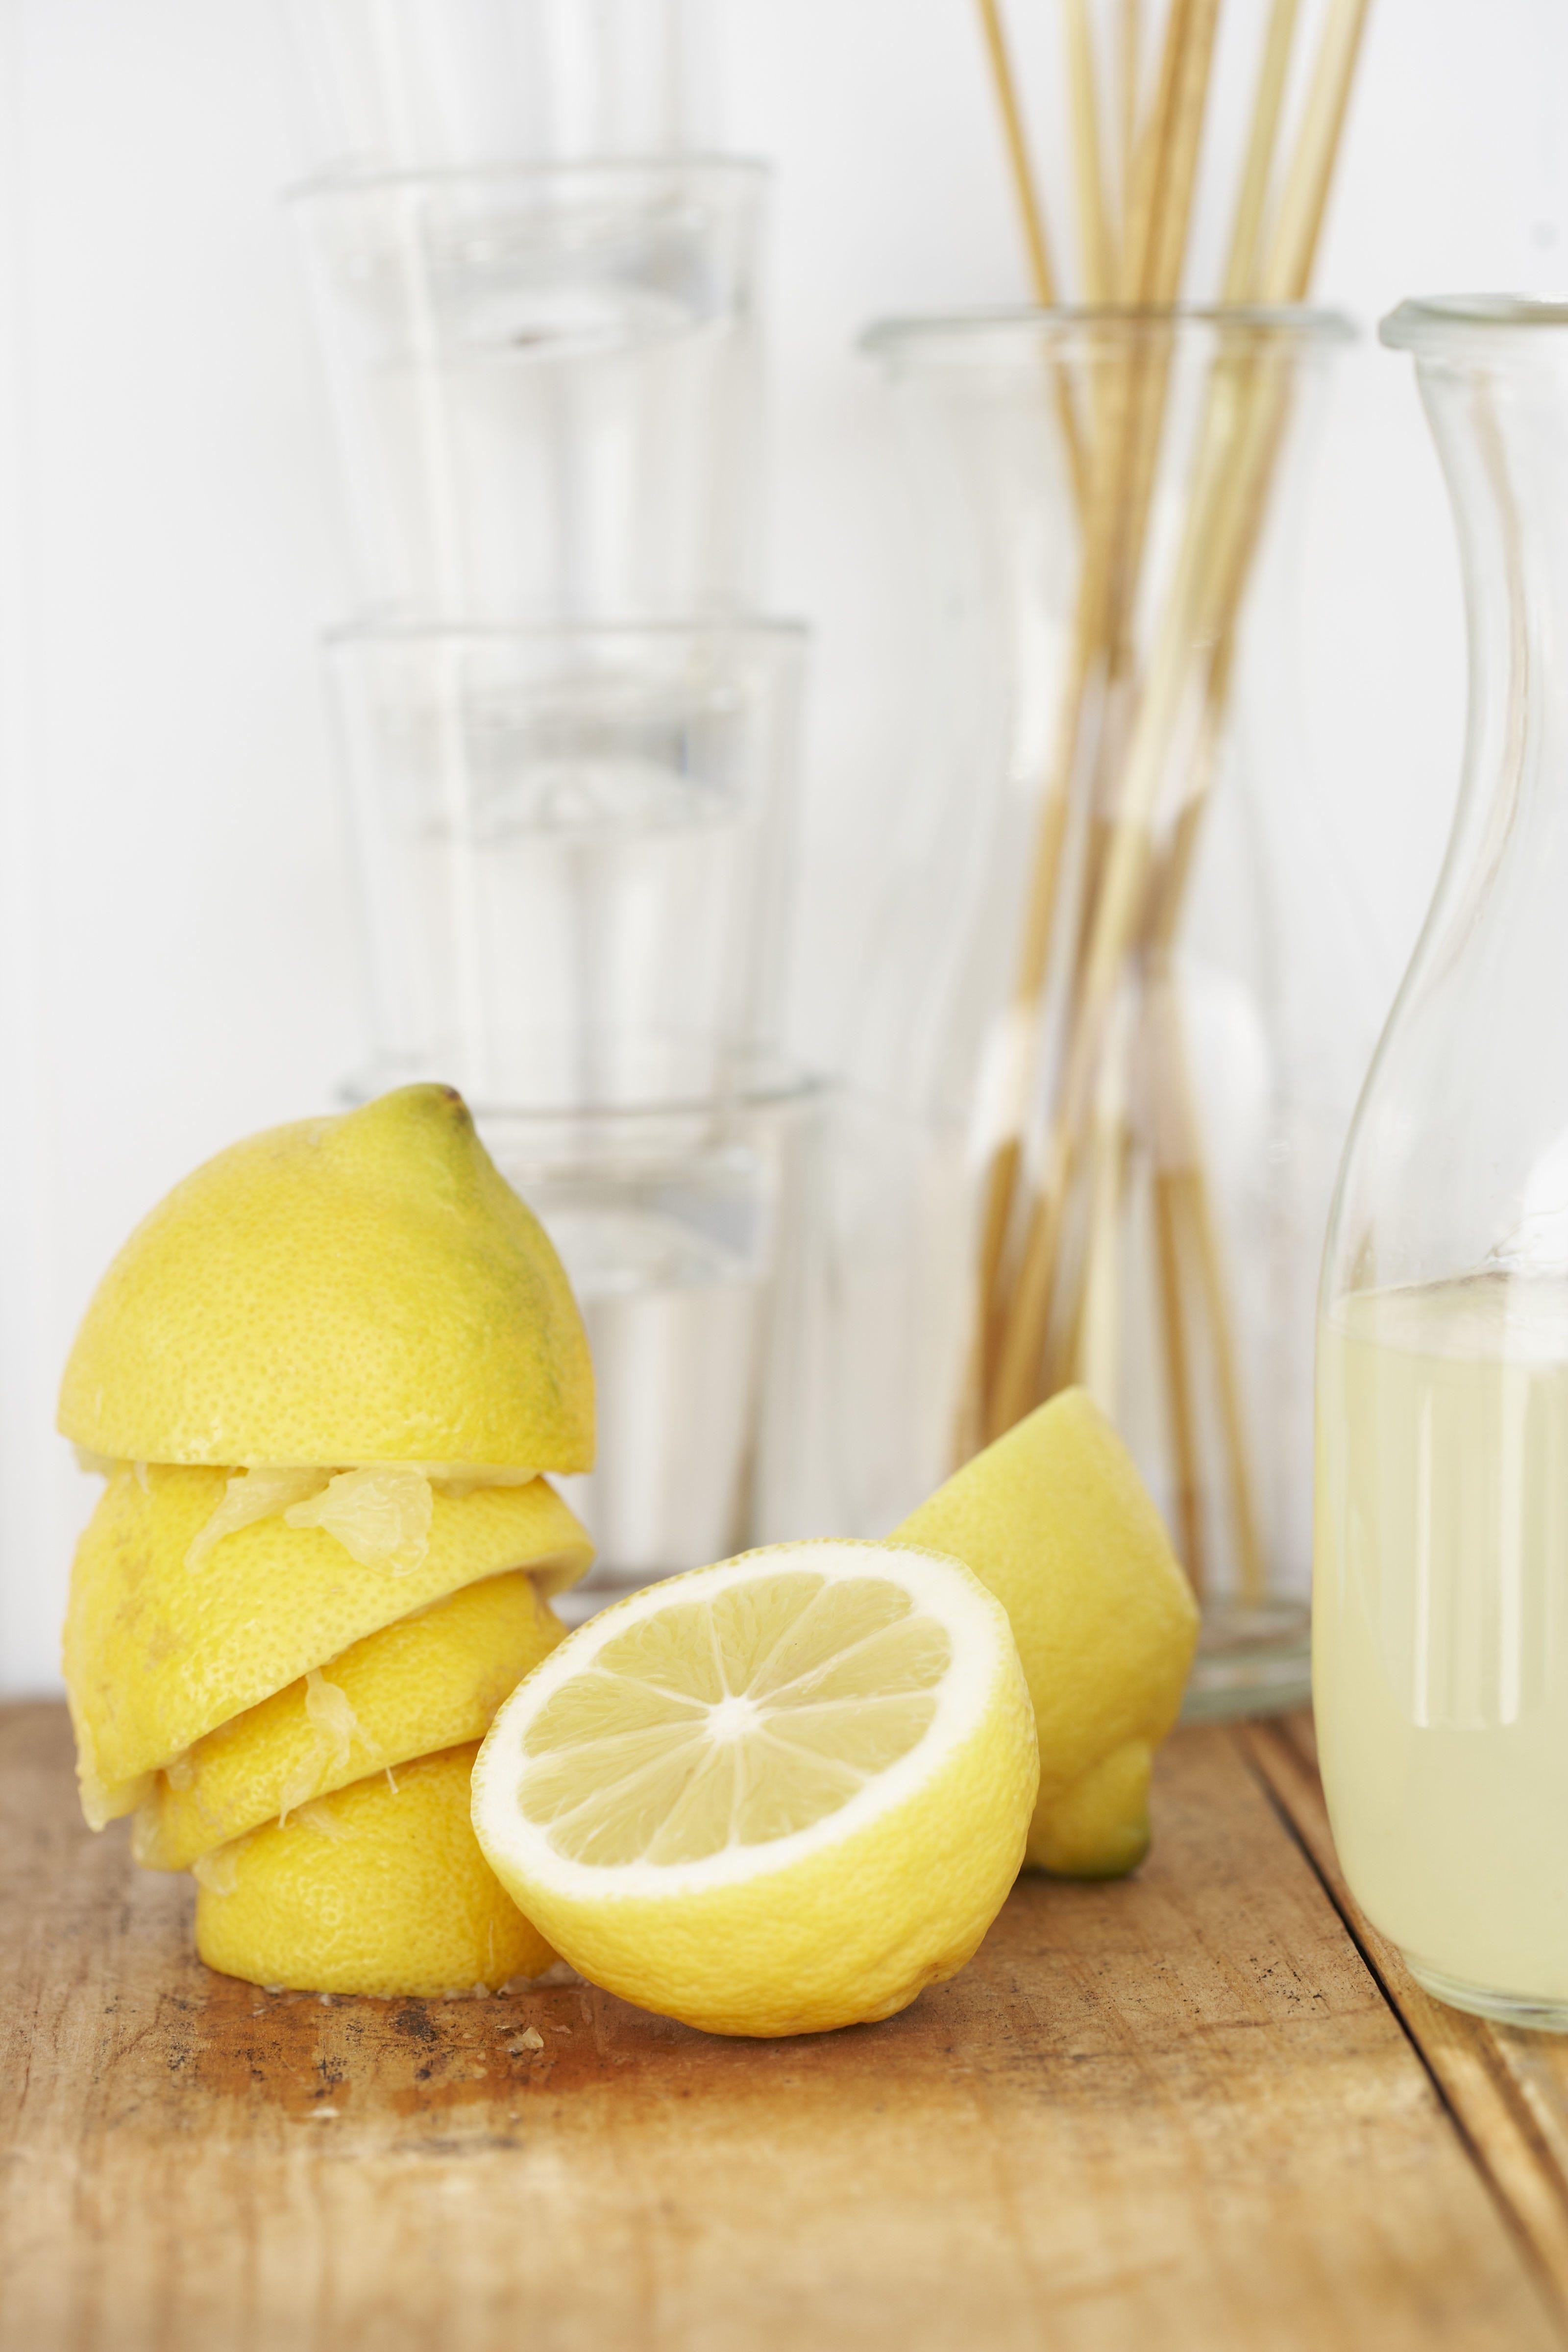 Lemon, Food, Meyer lemon, Yellow, Lemonade, Citrus, Drink, Ingredient, Juice, Lime,